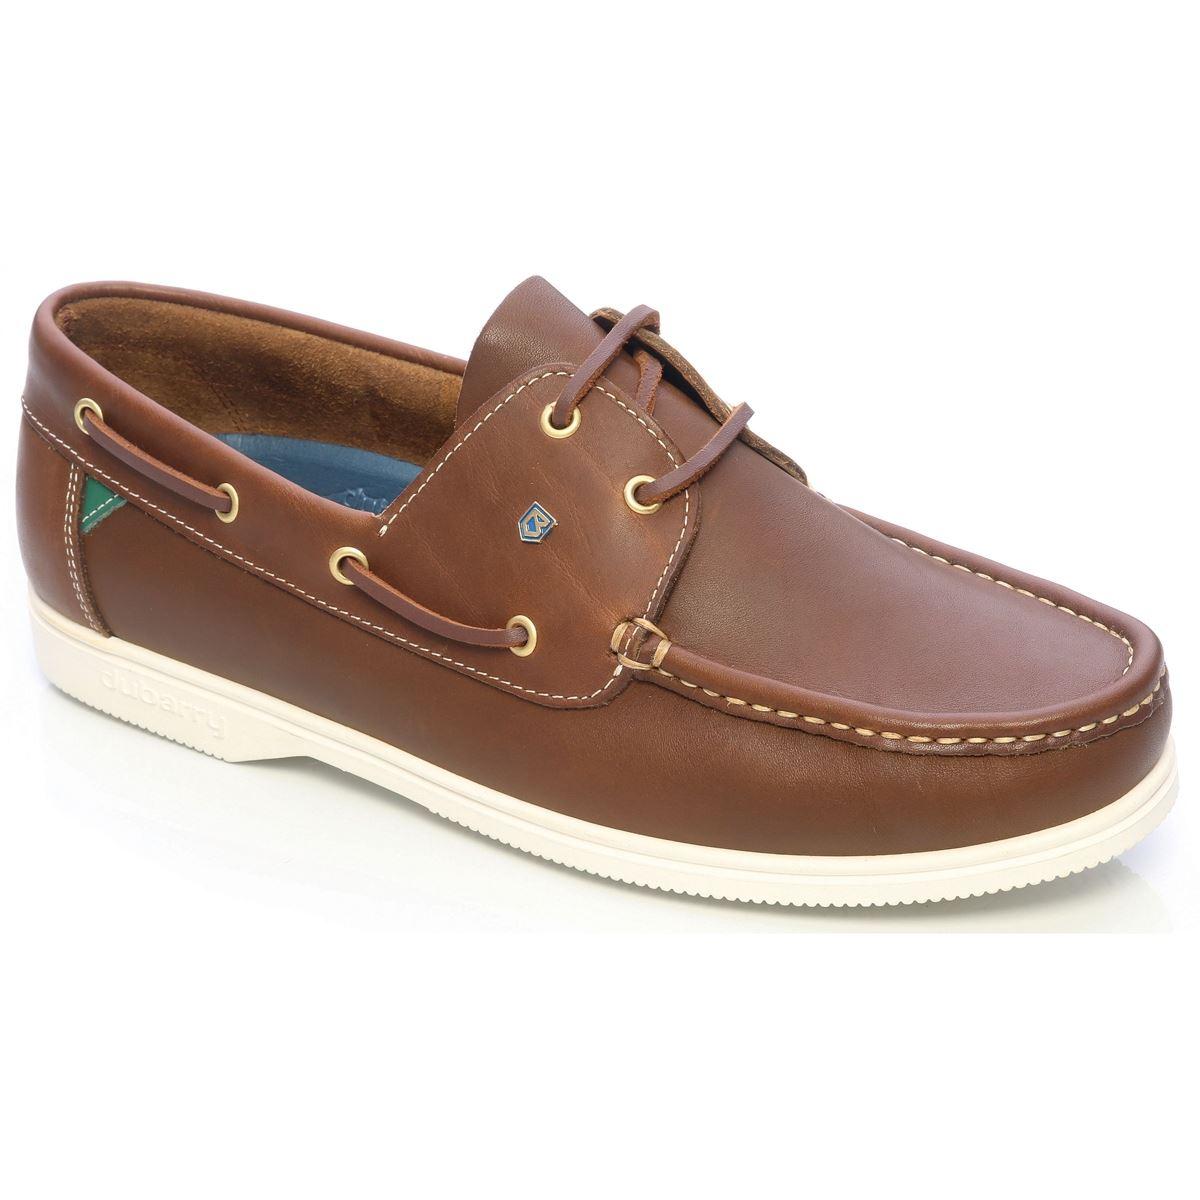 Dubarry Unisex Admirals Deck Shoe Brown 6 (EU39)